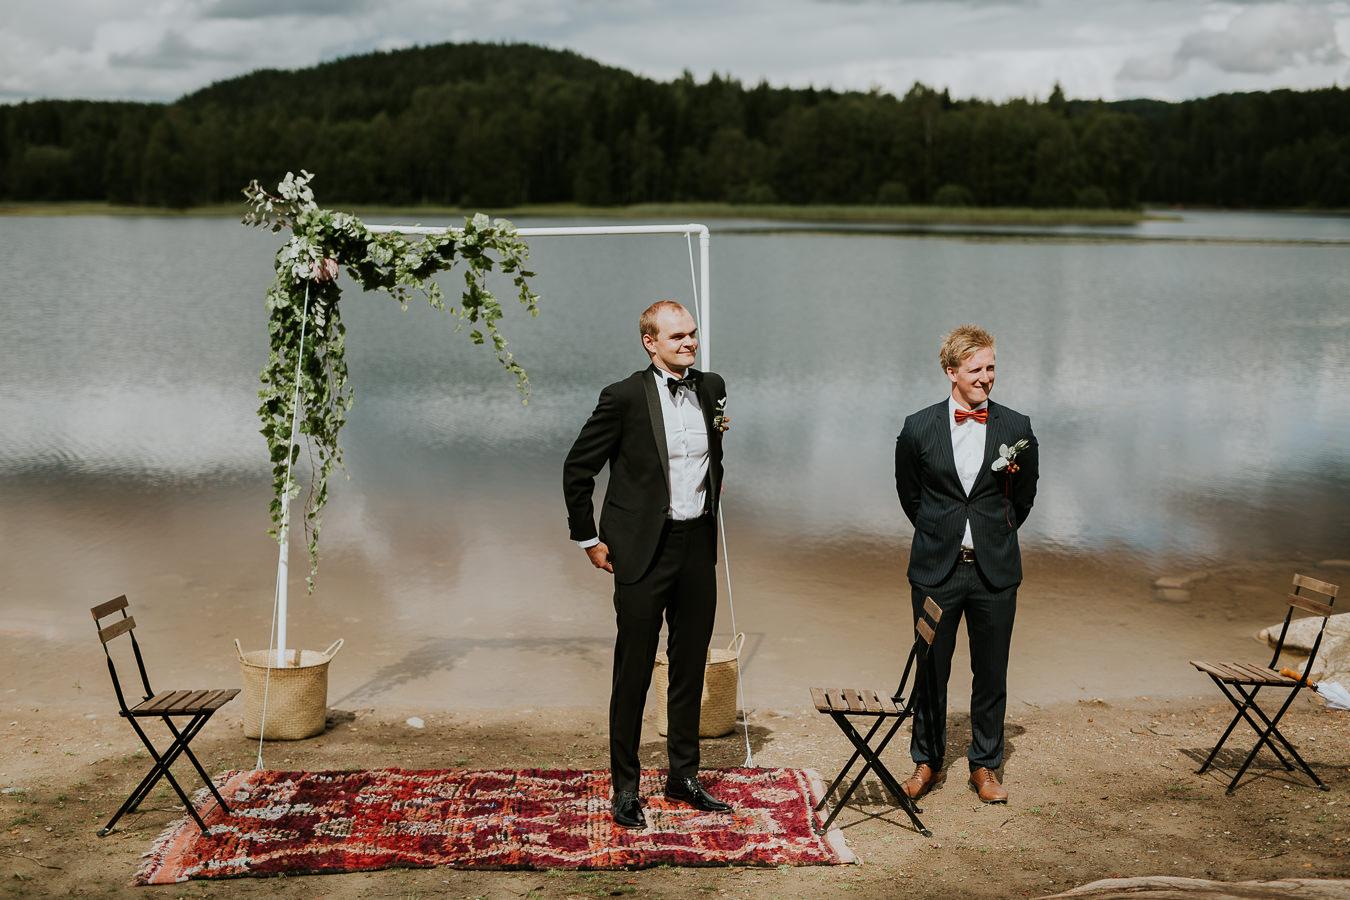 Bryllup-Lageret-Tofte-bryllupsfotograf-115.jpg